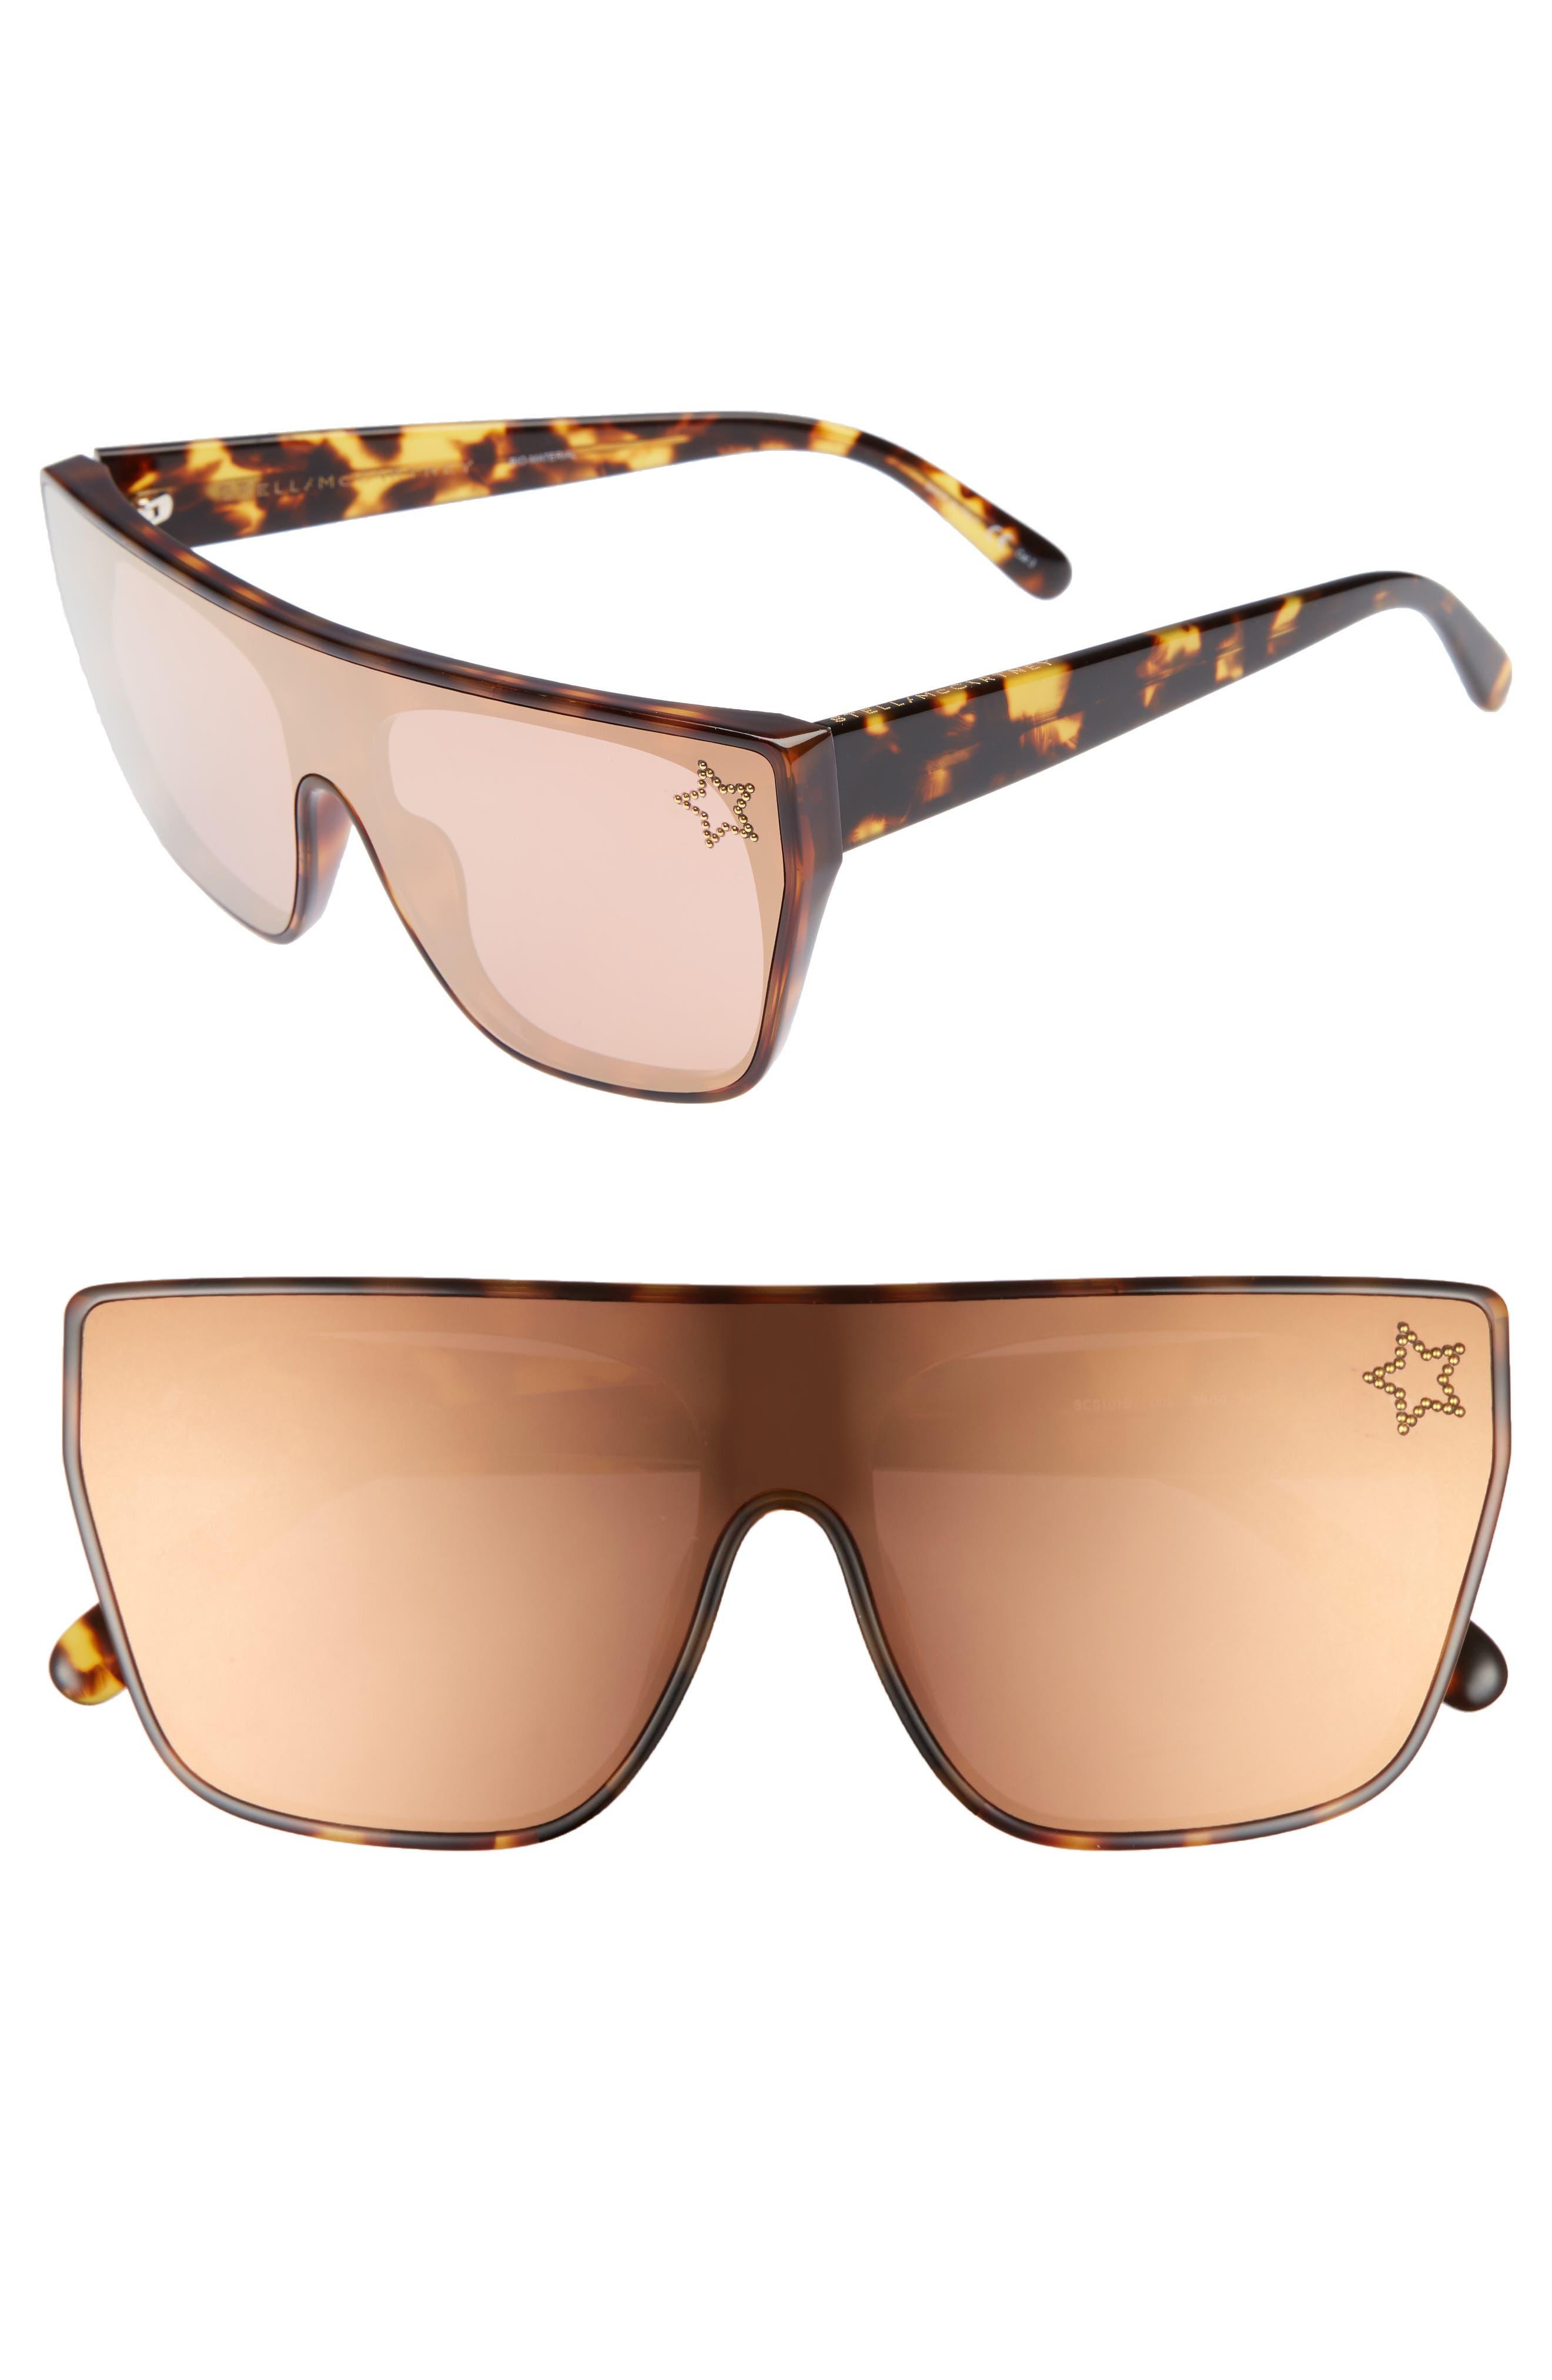 Stella McCartney 99mm Flat Top Sunglasses